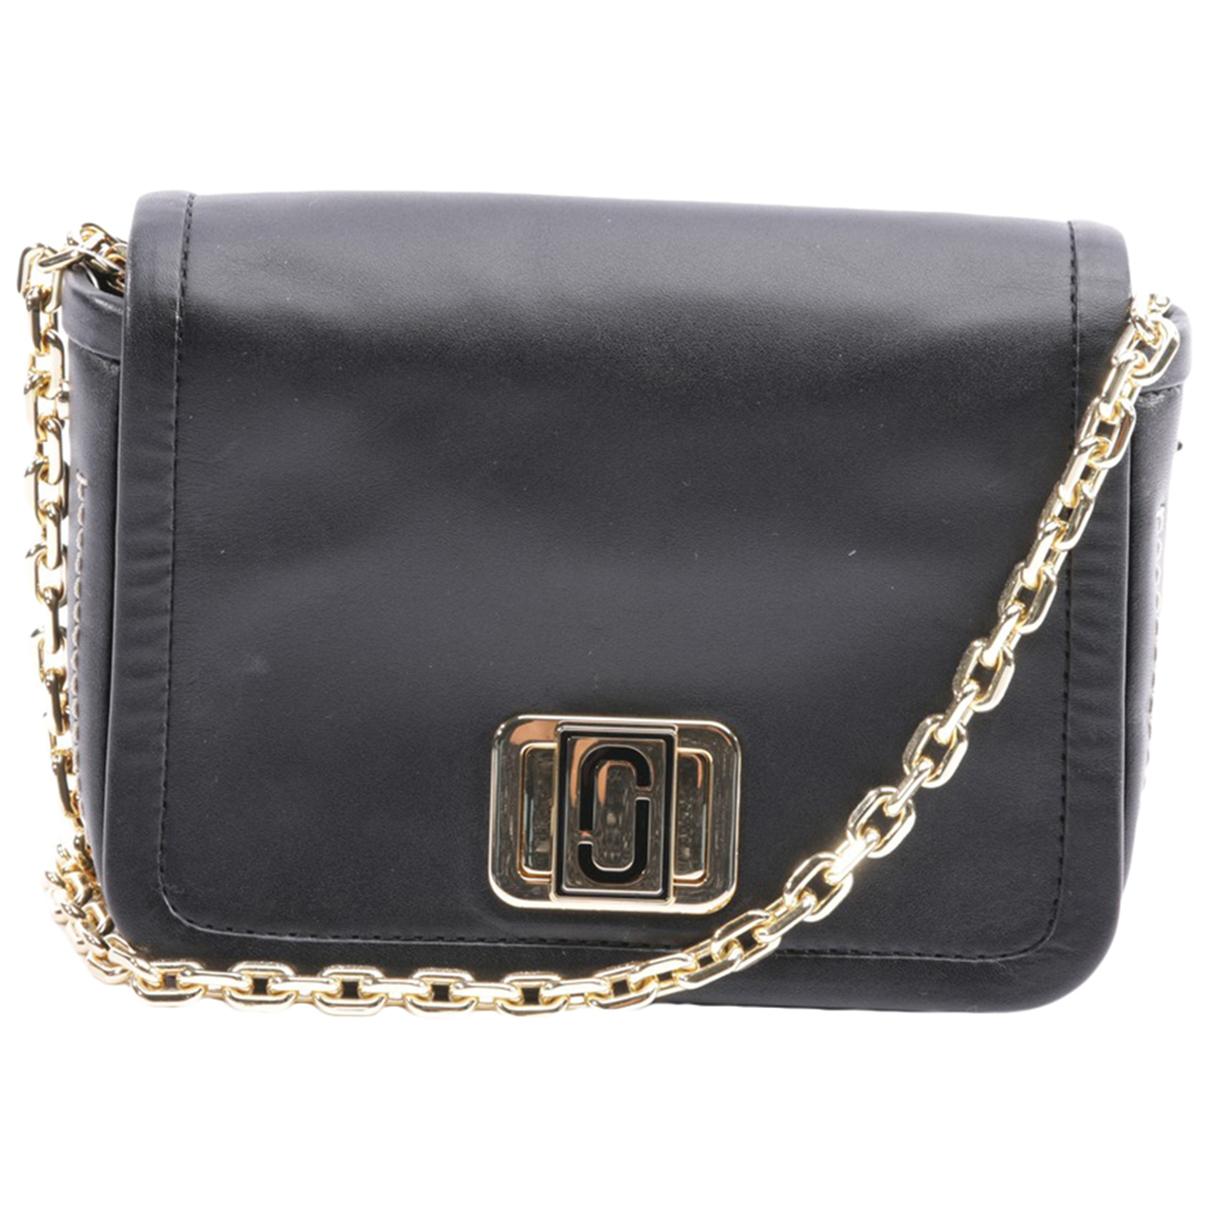 Marc Jacobs N Black Leather Clutch bag for Women N